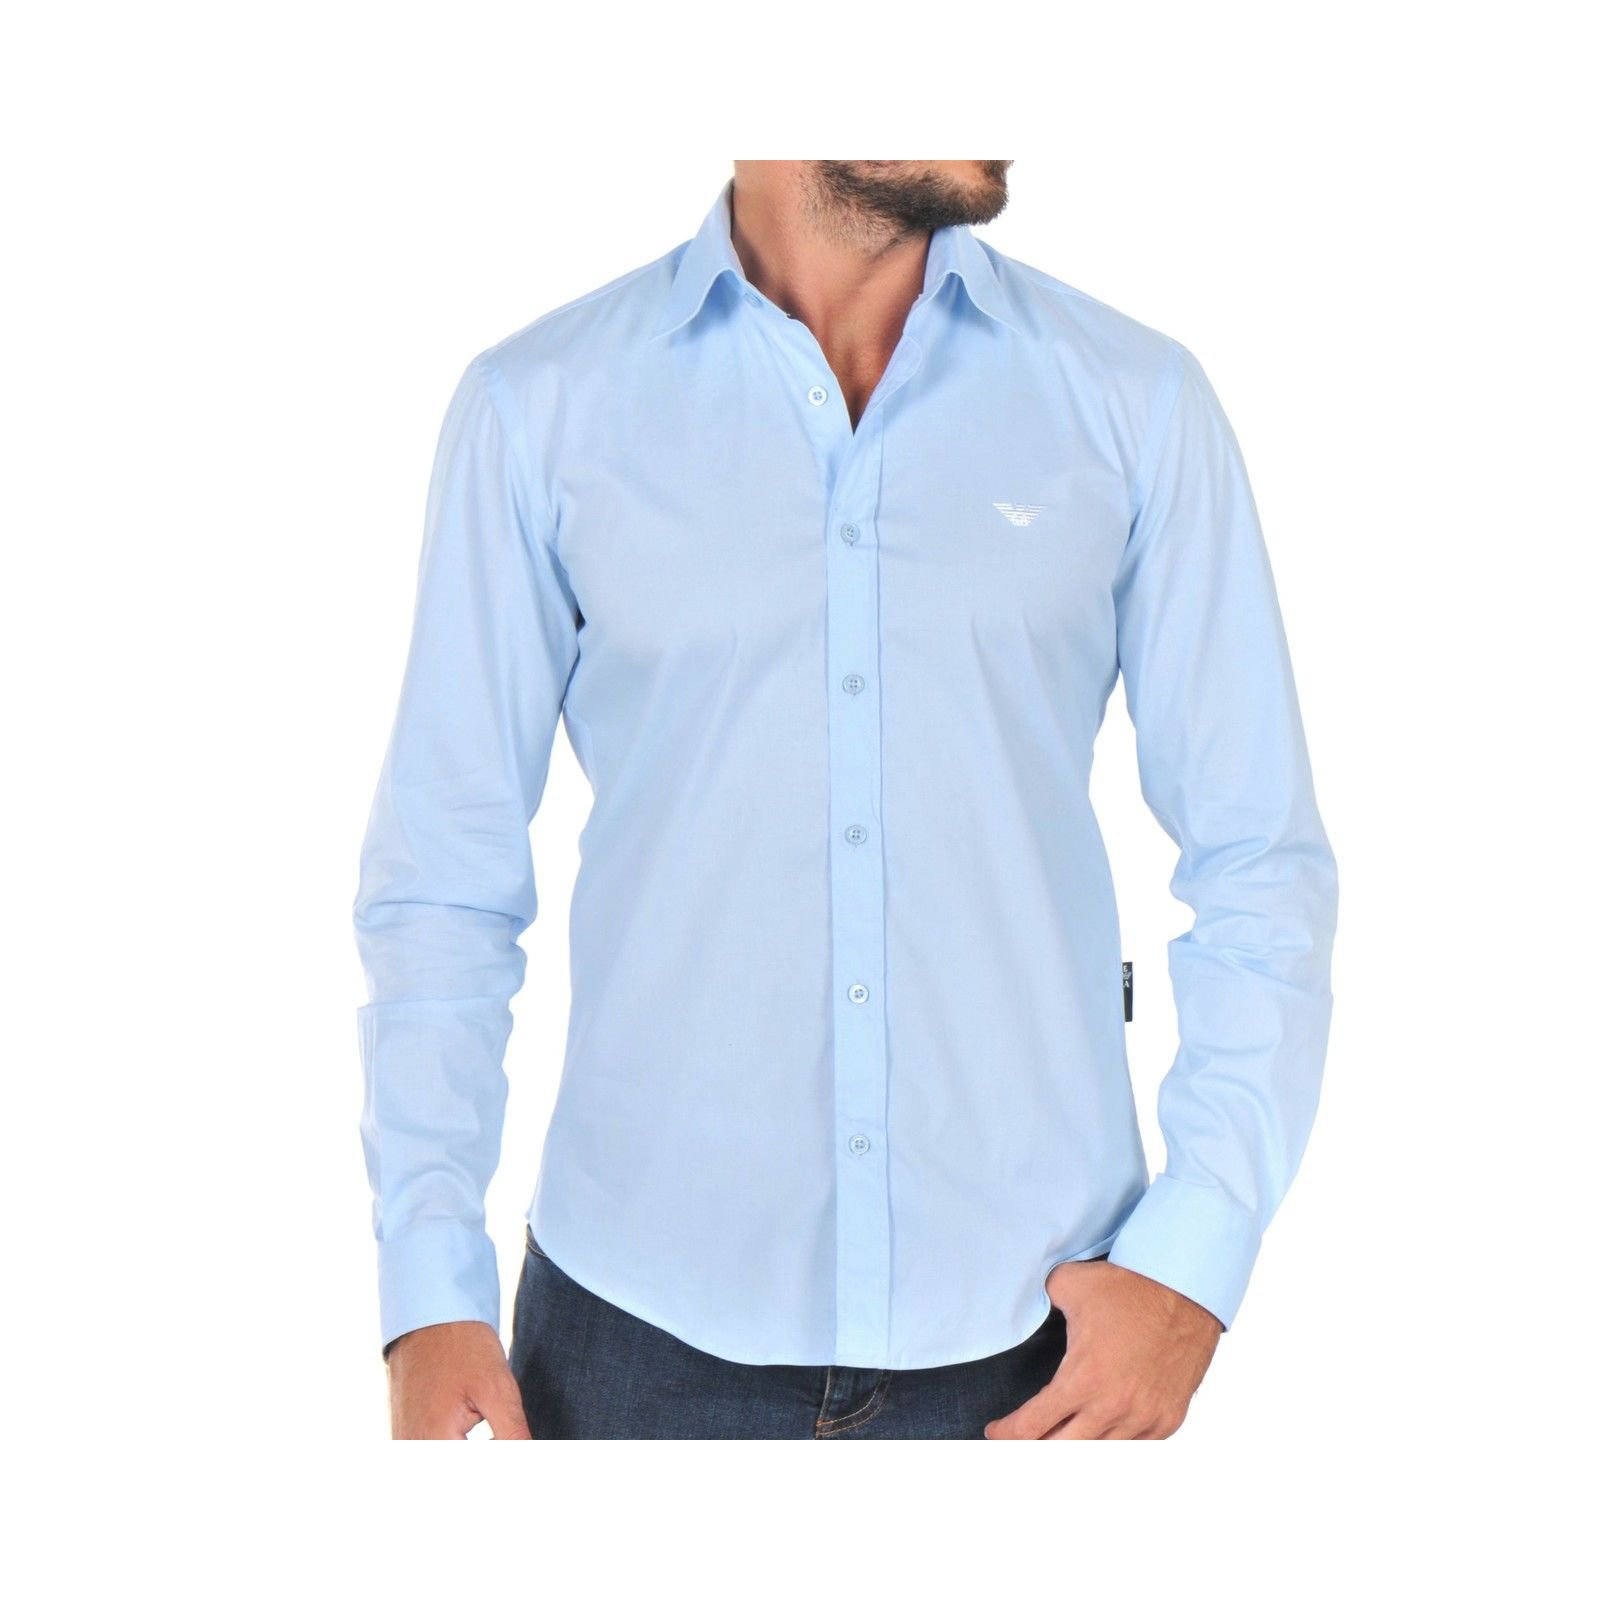 5a415a48f2 men's light blue casual fashion shirt nwt